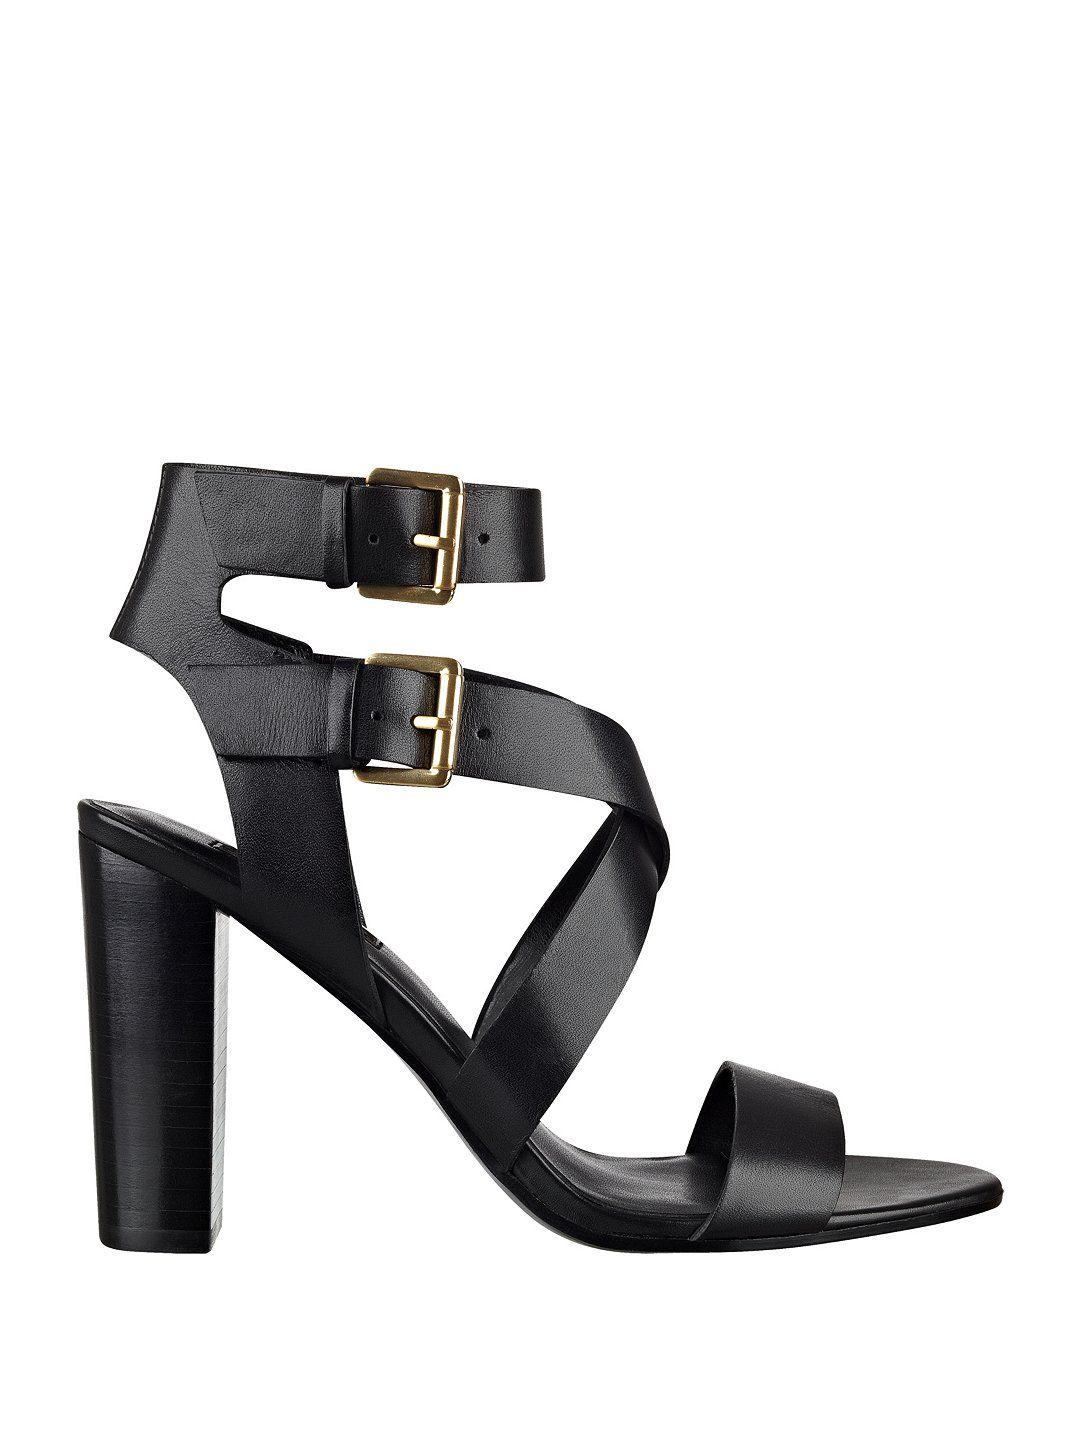 3d908d8c848ae Bressa City Sandals